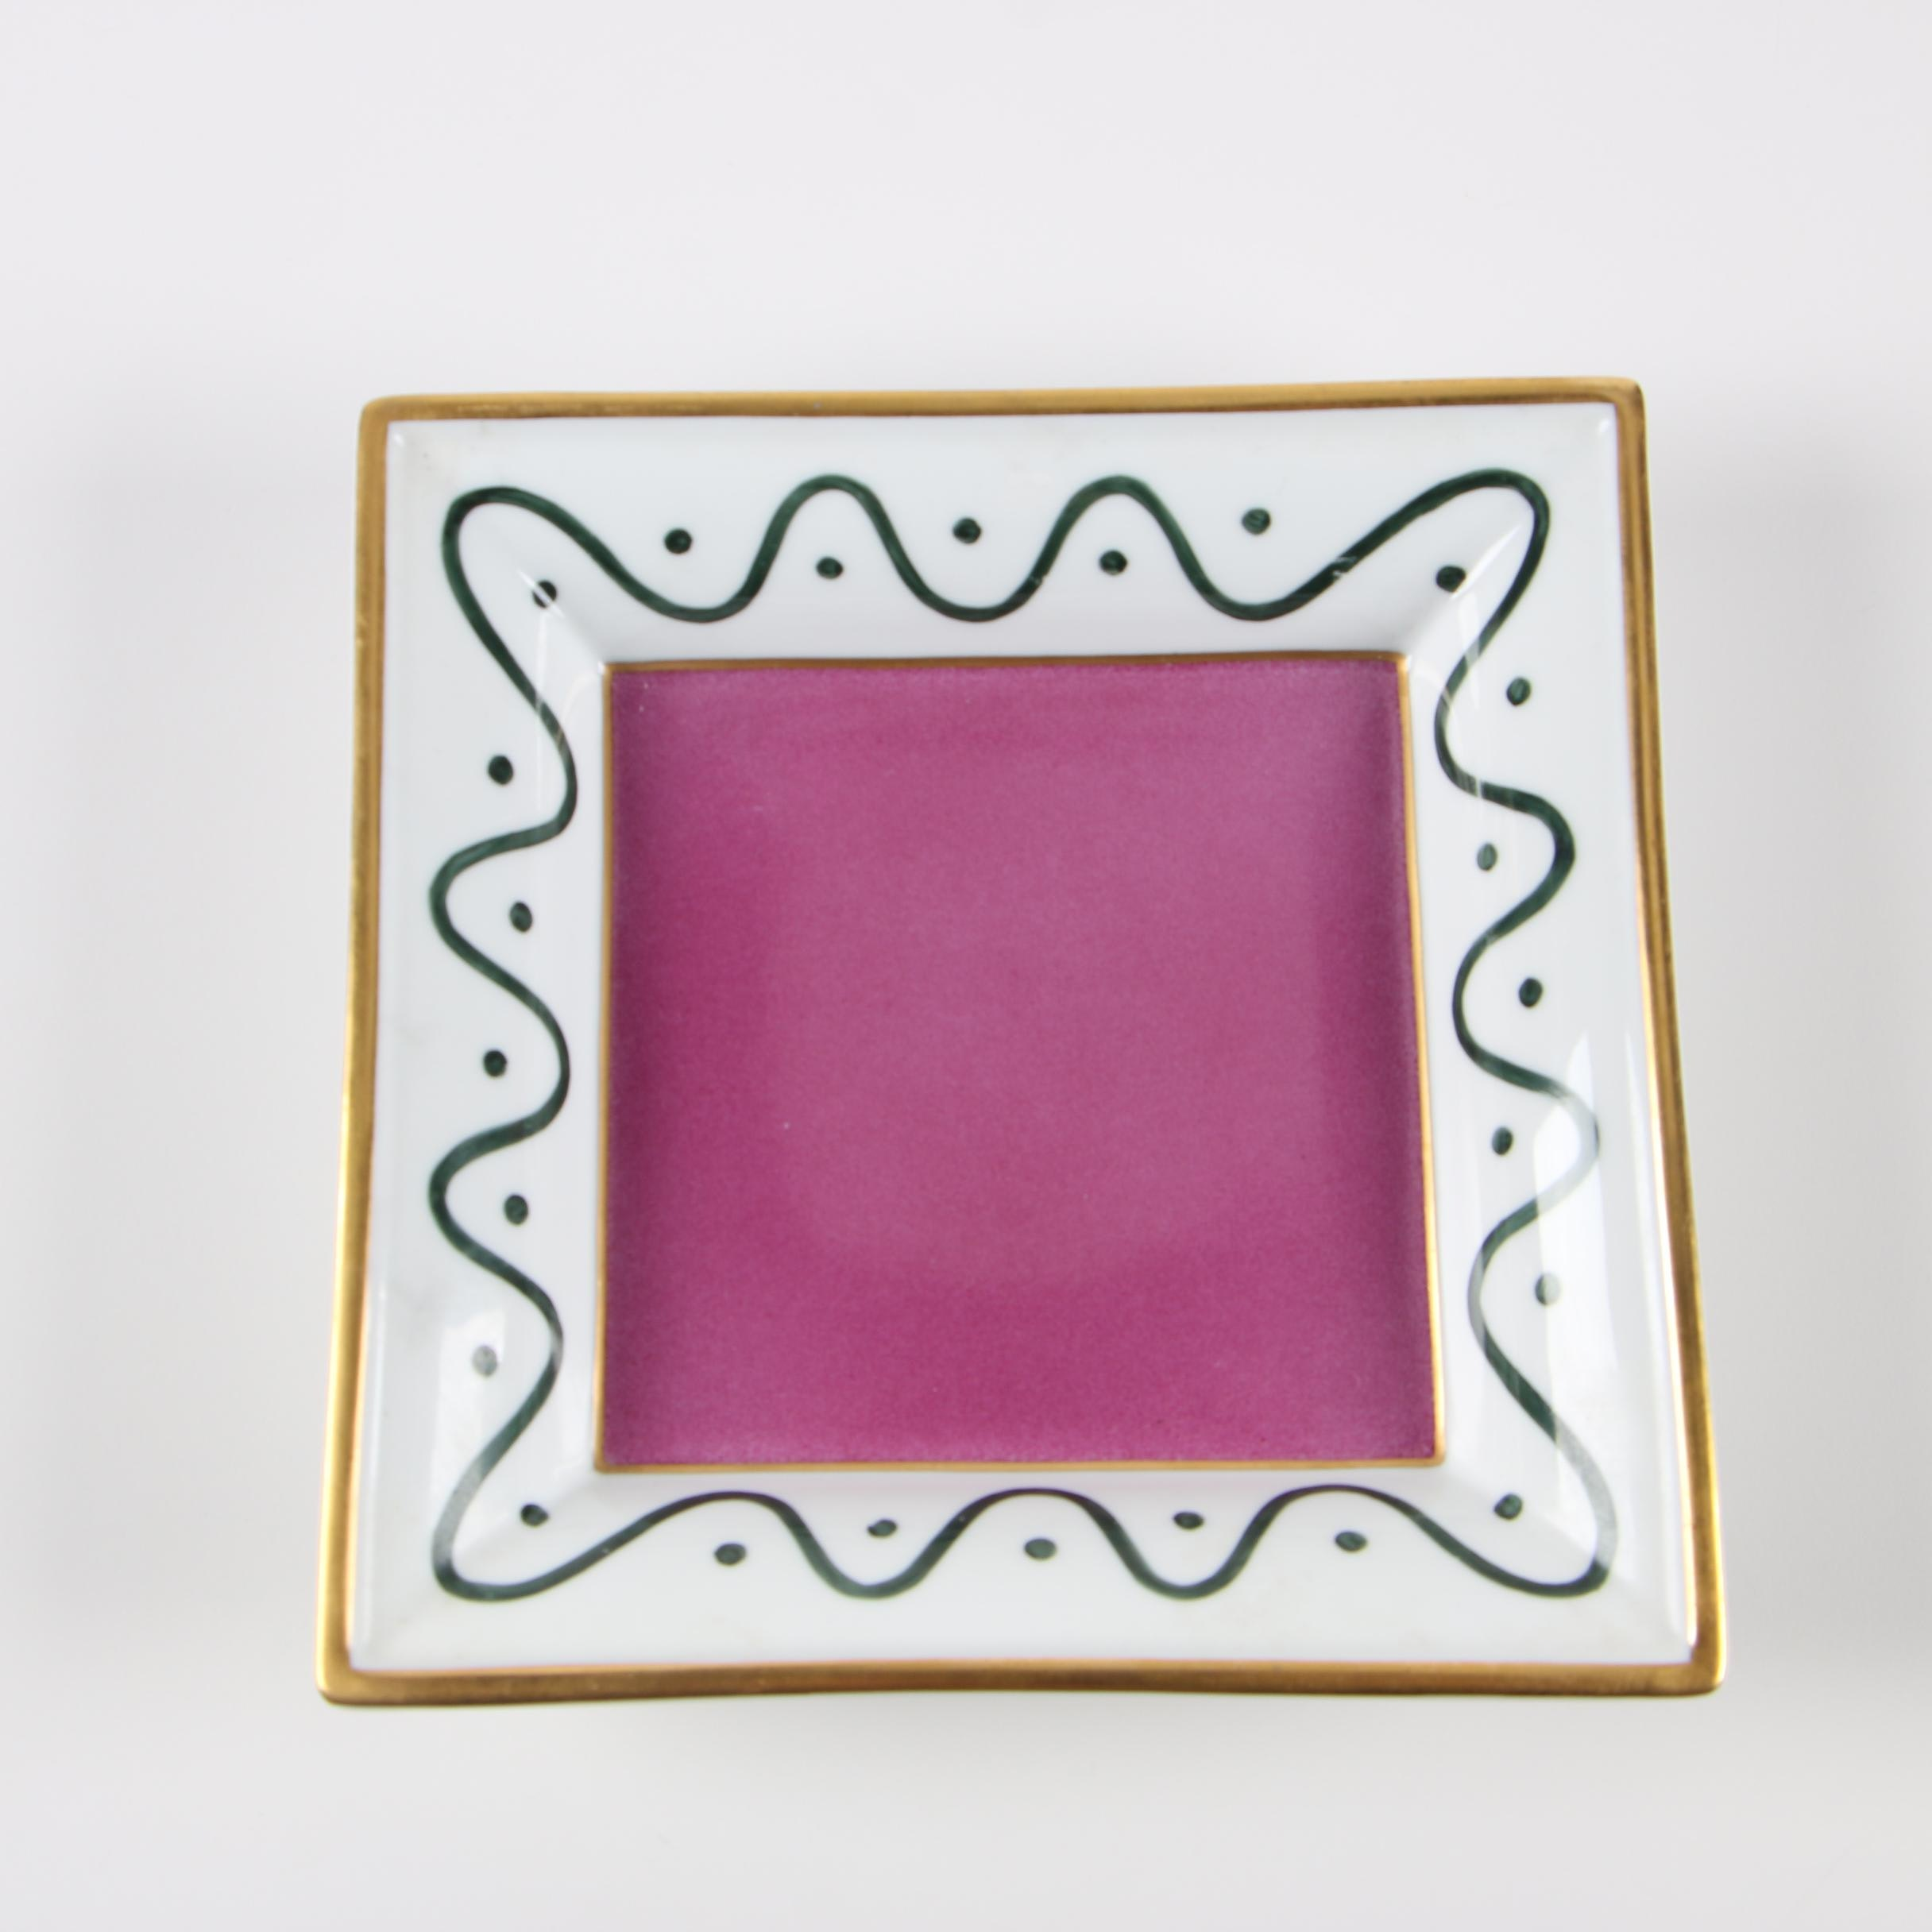 Limoges Hand-Painted Porcelain Dish